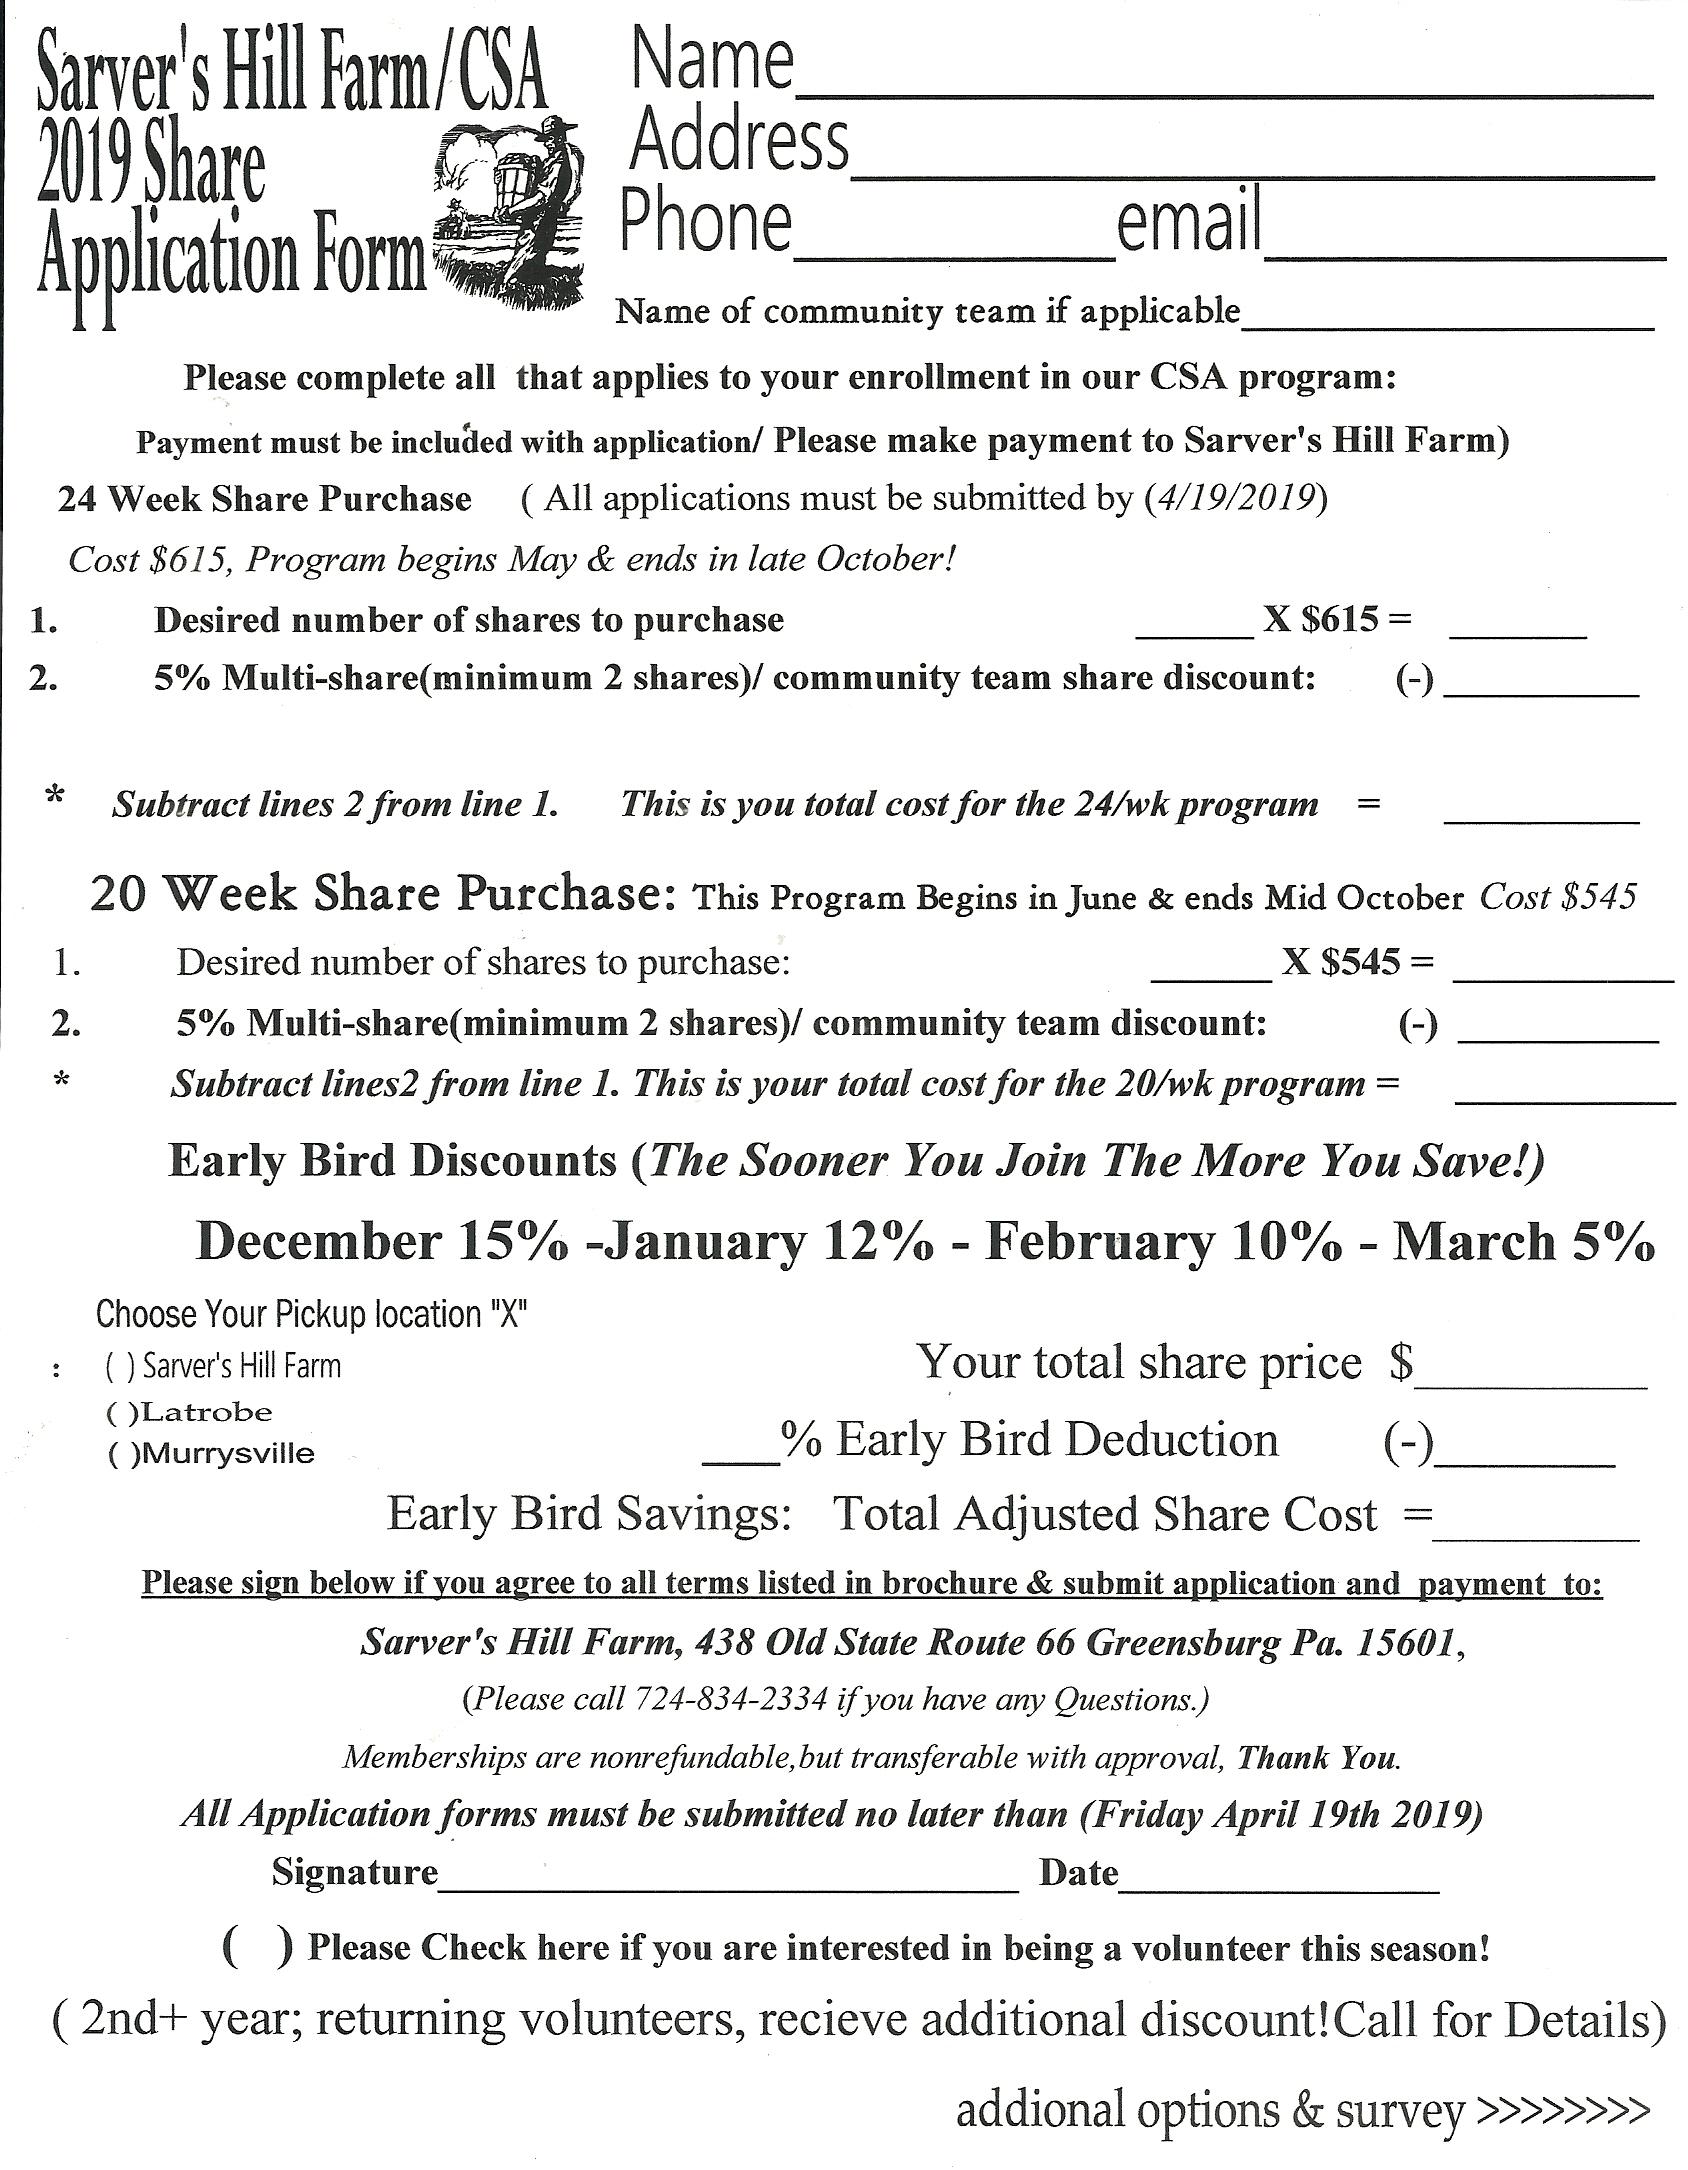 Sarver Hill Farm & CSA : CSA Application page :click here